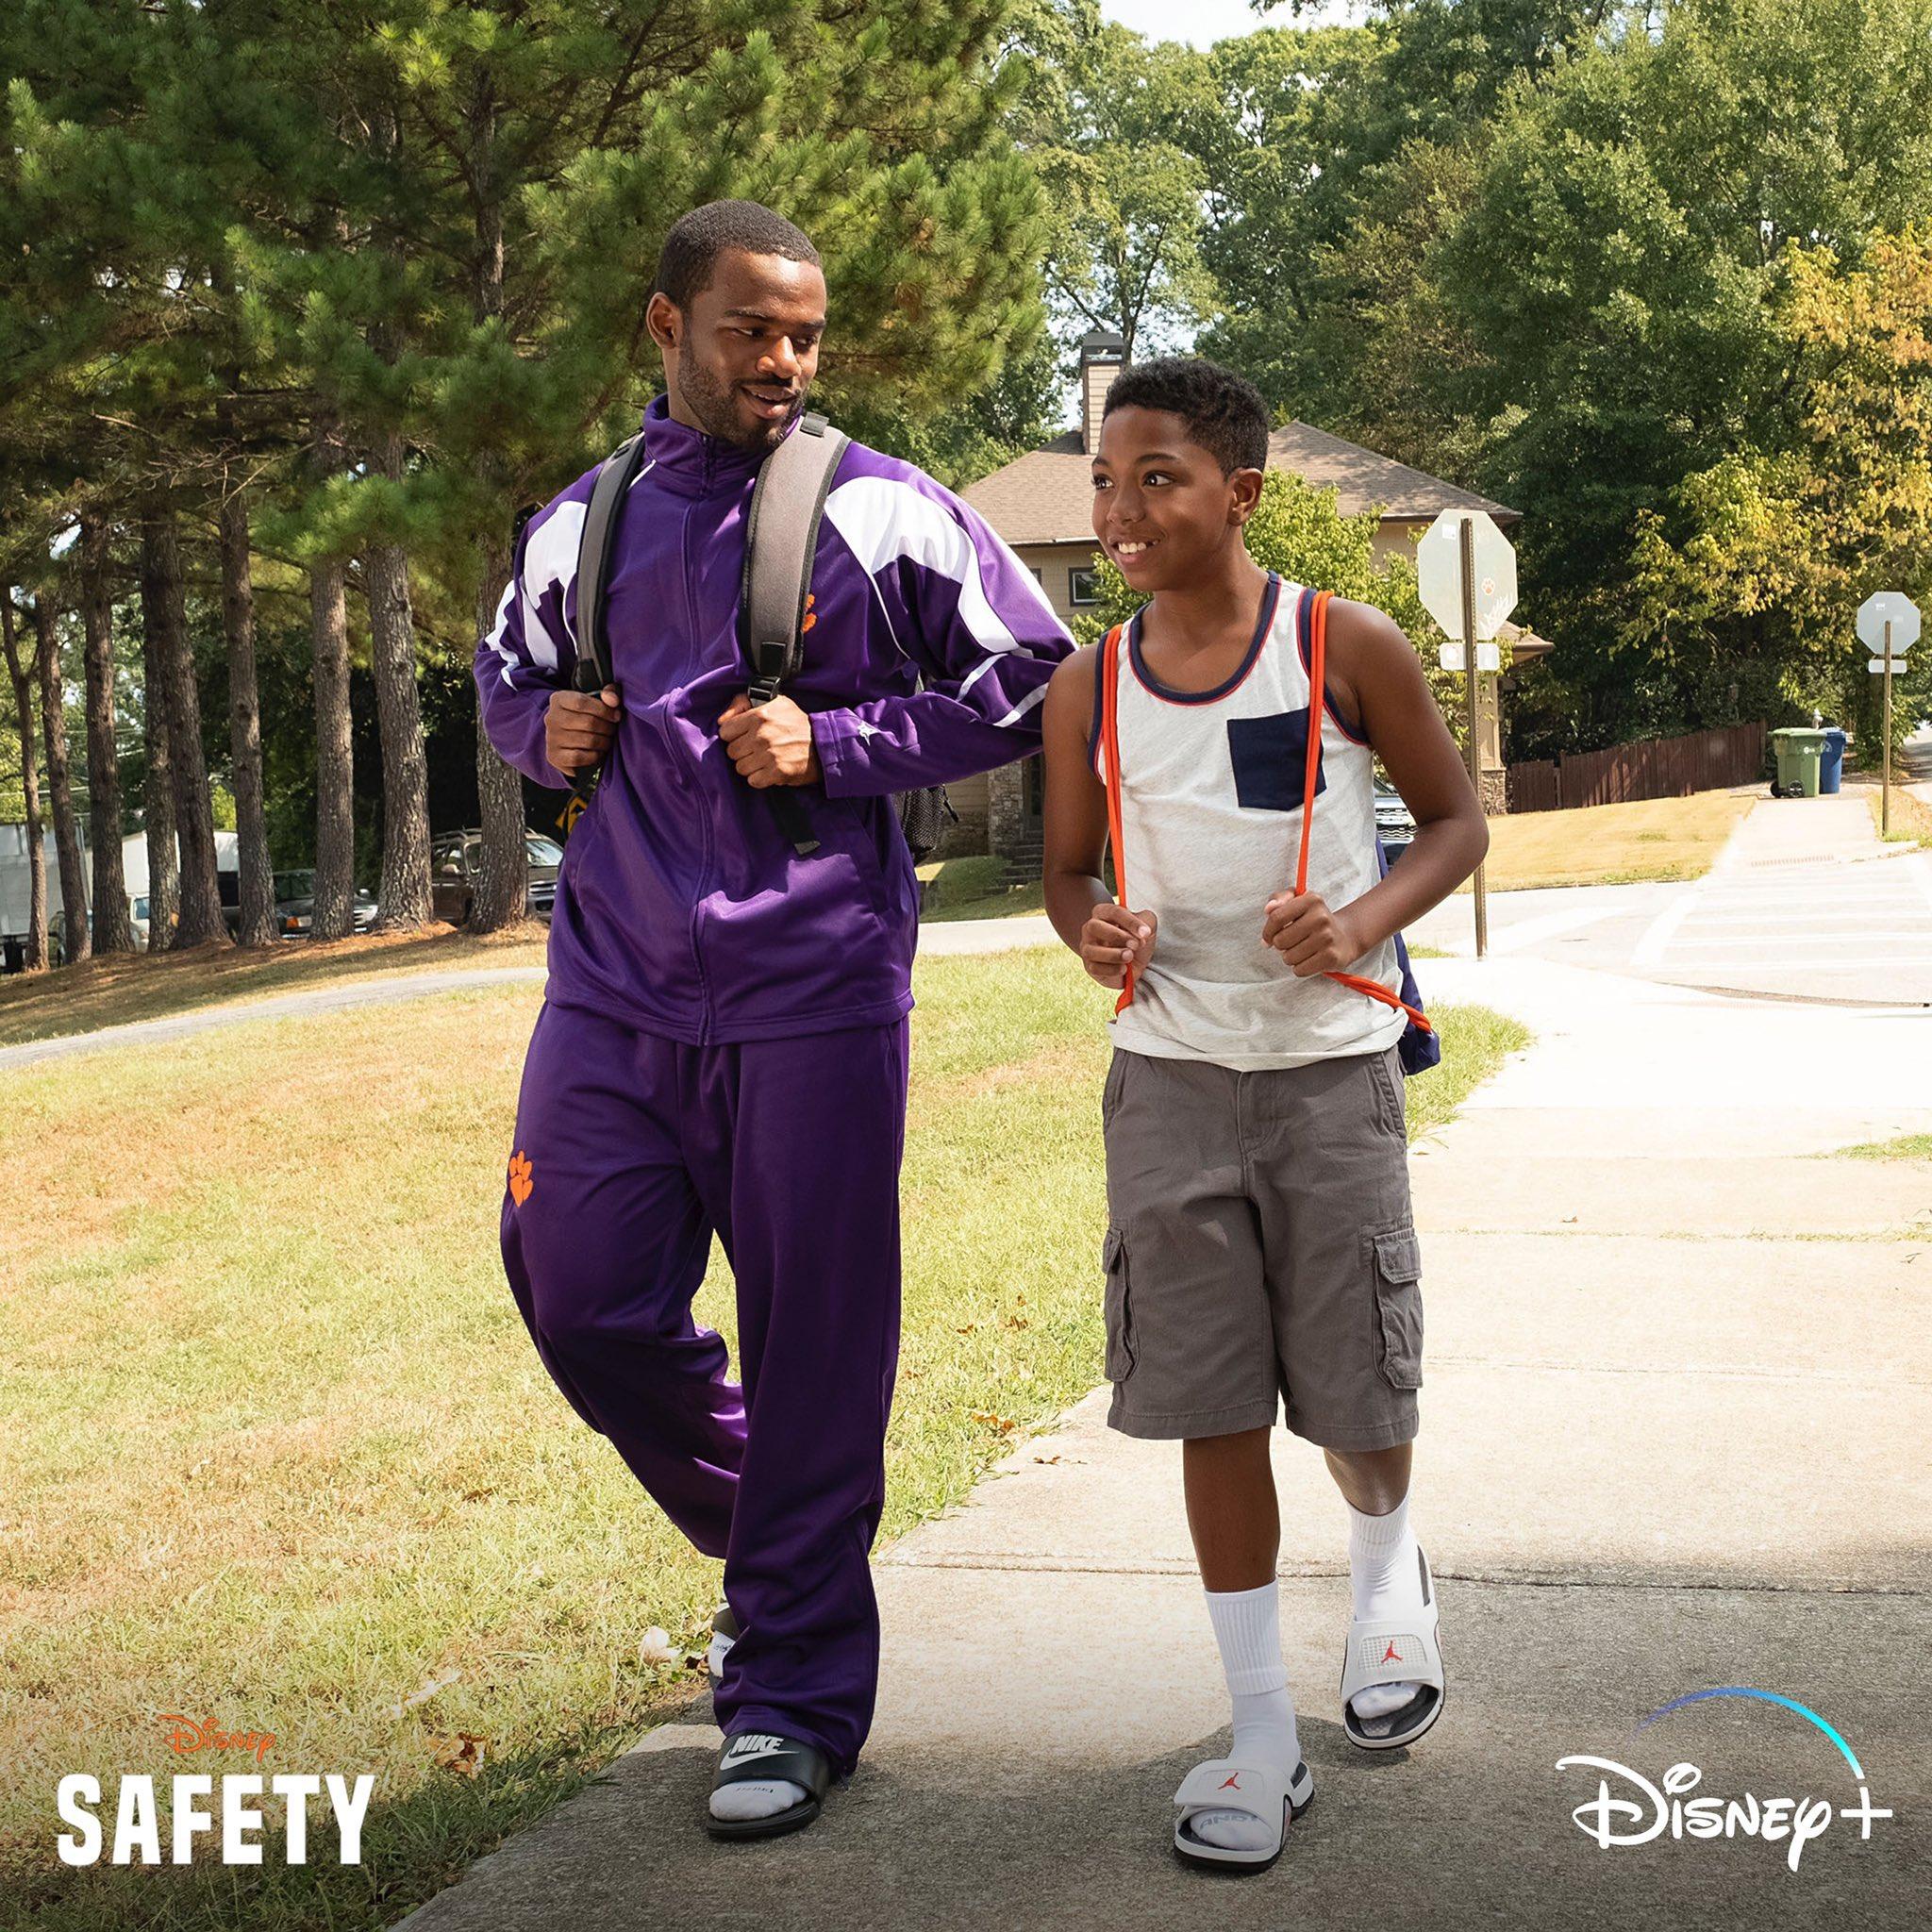 Safety [Disney - 2020] Emk5By9XcAIek96?format=jpg&name=large